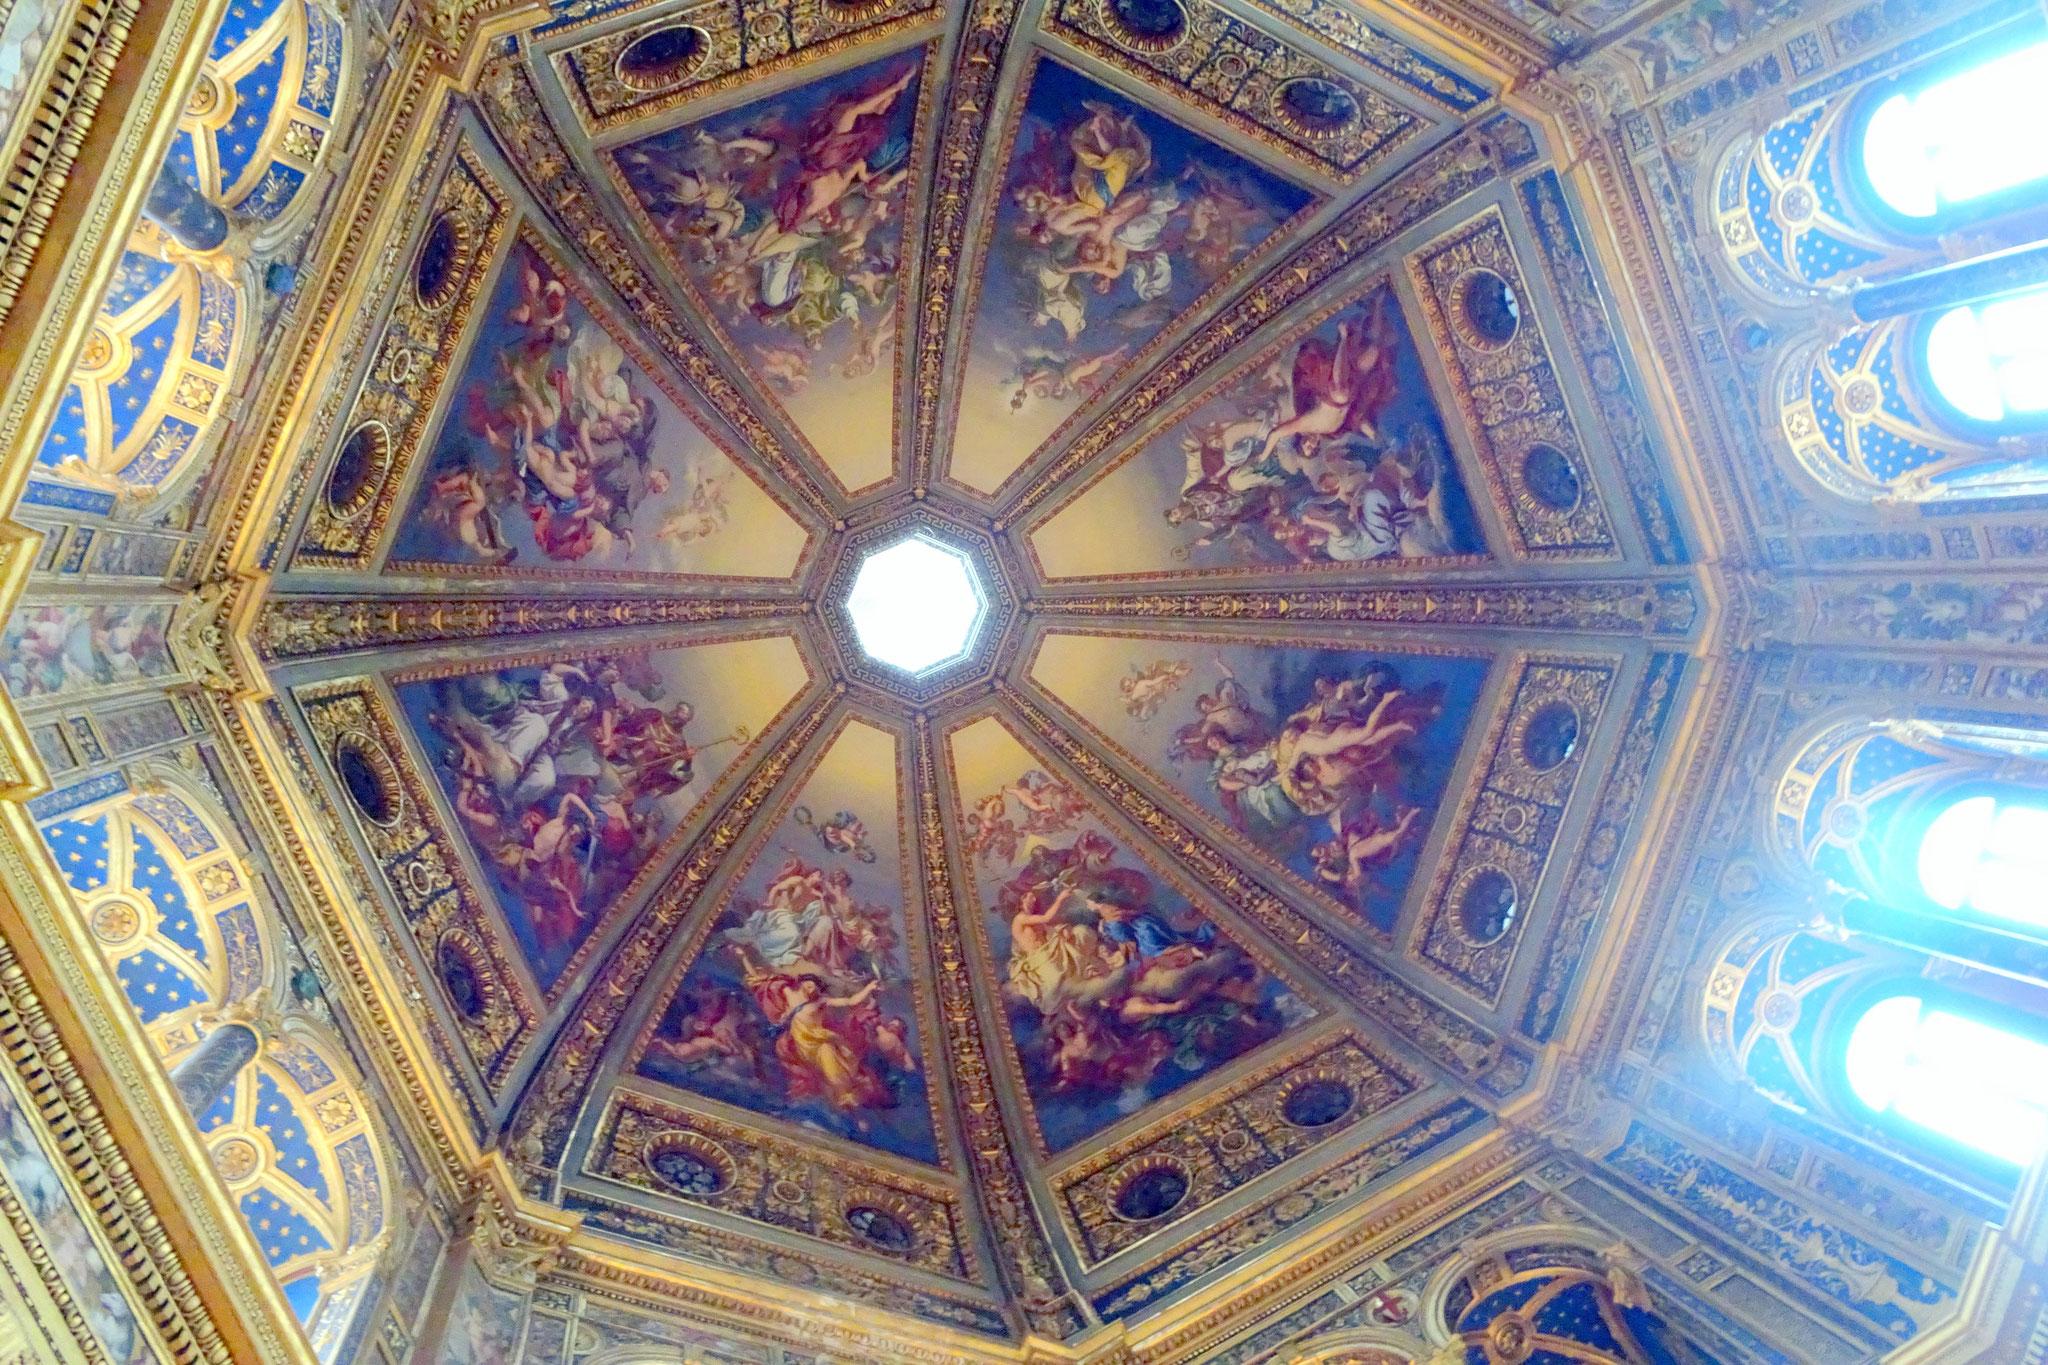 Lodi, coupole de la chapelle dell'Incoronata